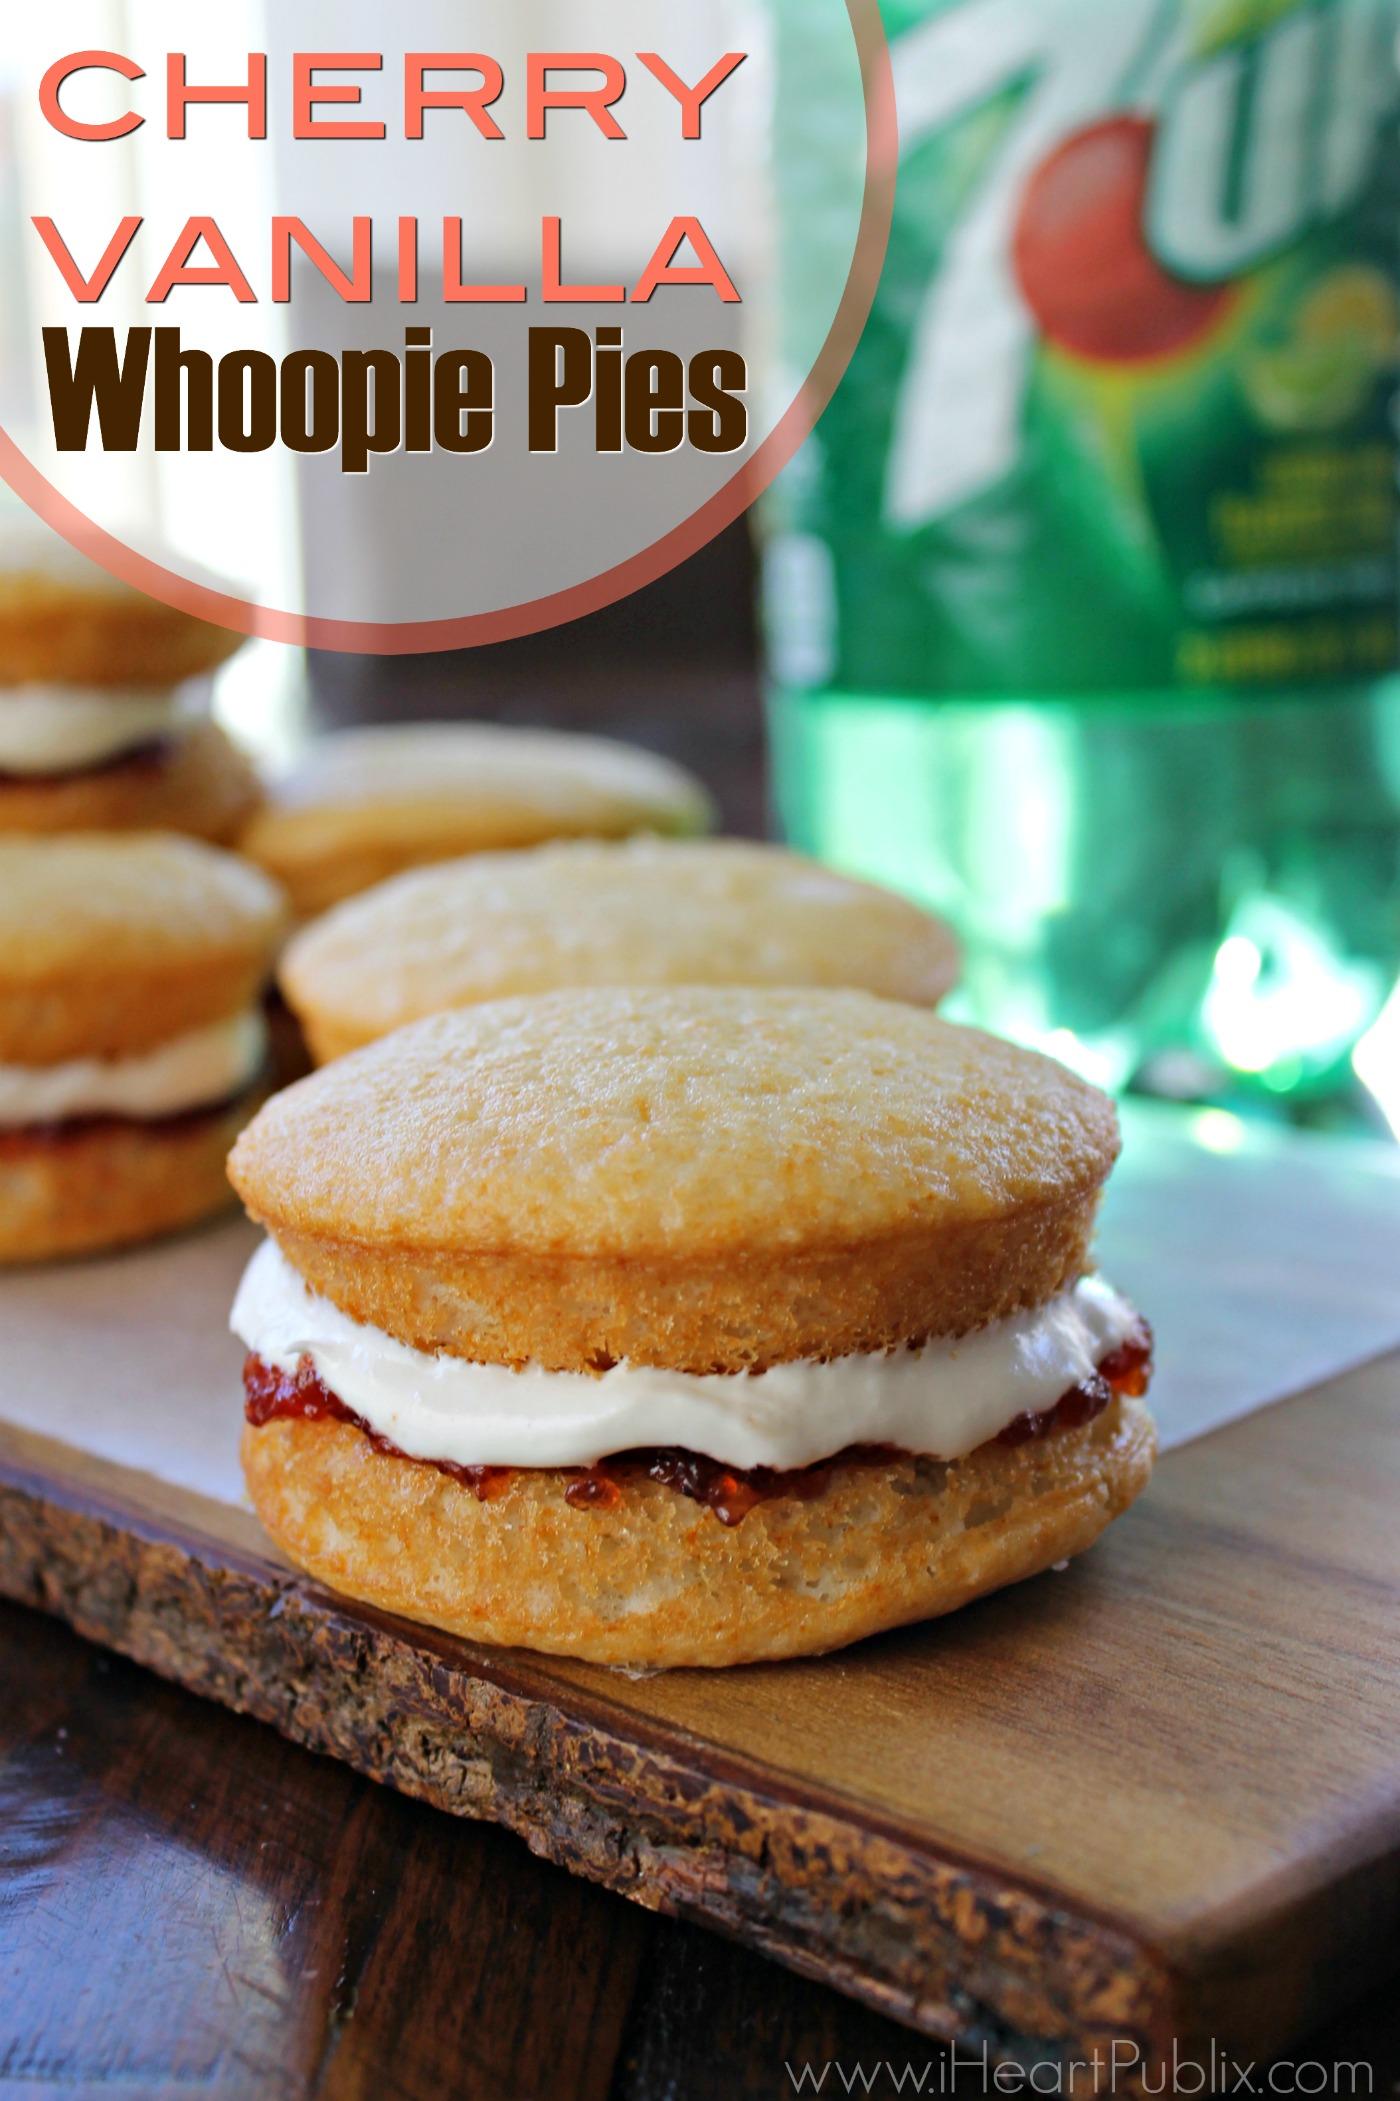 Cherry Vanilla Whoopie Pies